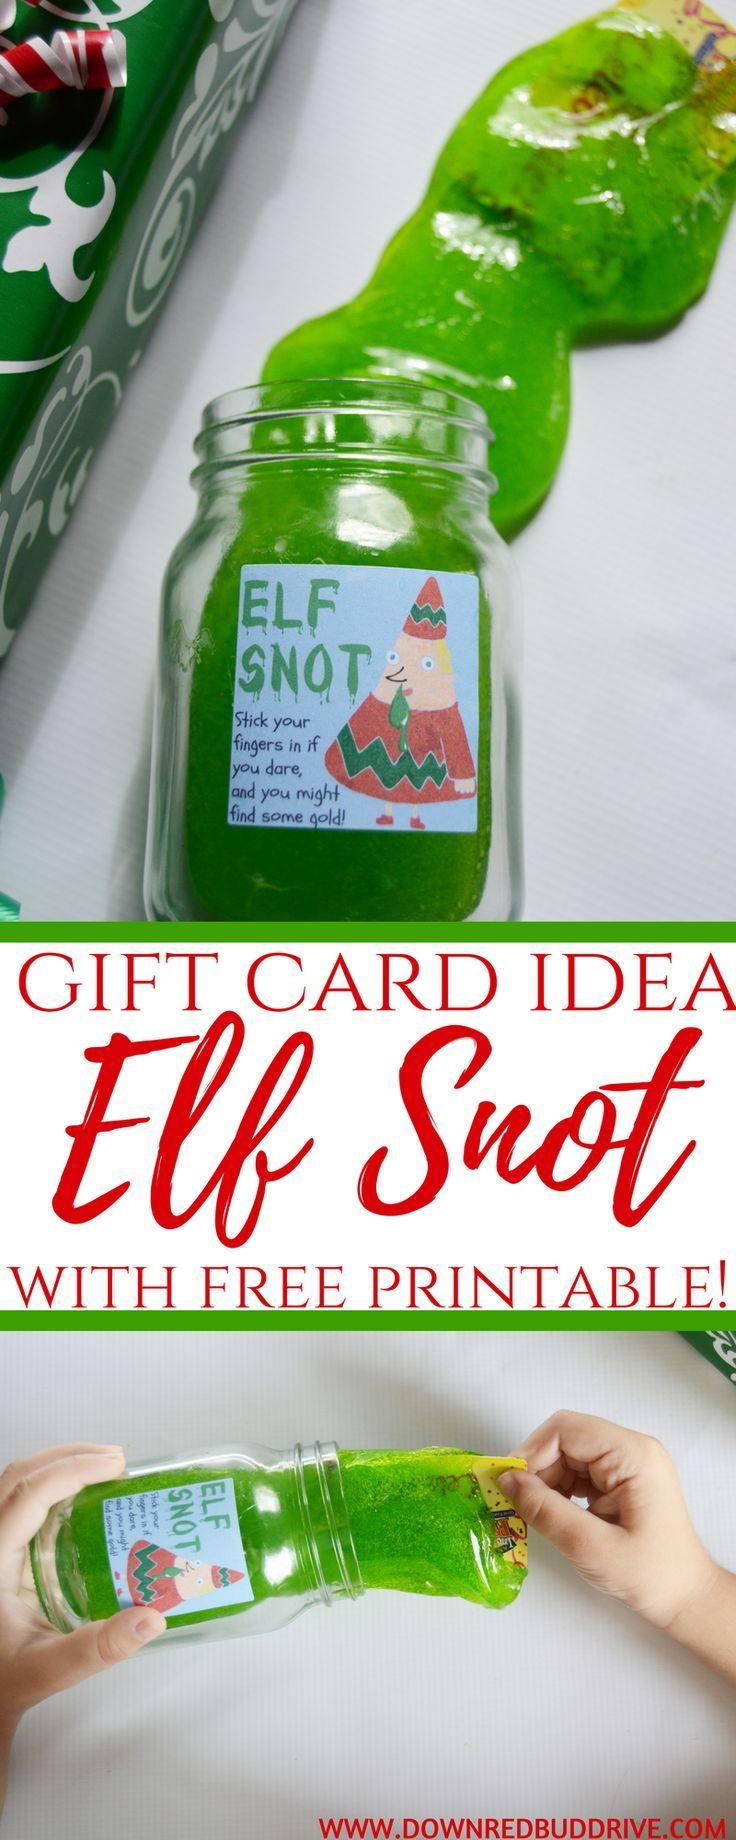 Elf Snot | Gift Card Gifts | Christmas DIY | Christmas Craft | Christmas GIft DIY | Christmas Kids Activity | Slime Recipe | Easy Slime Recipe | Christmas Slime | Gag Gift Idea |